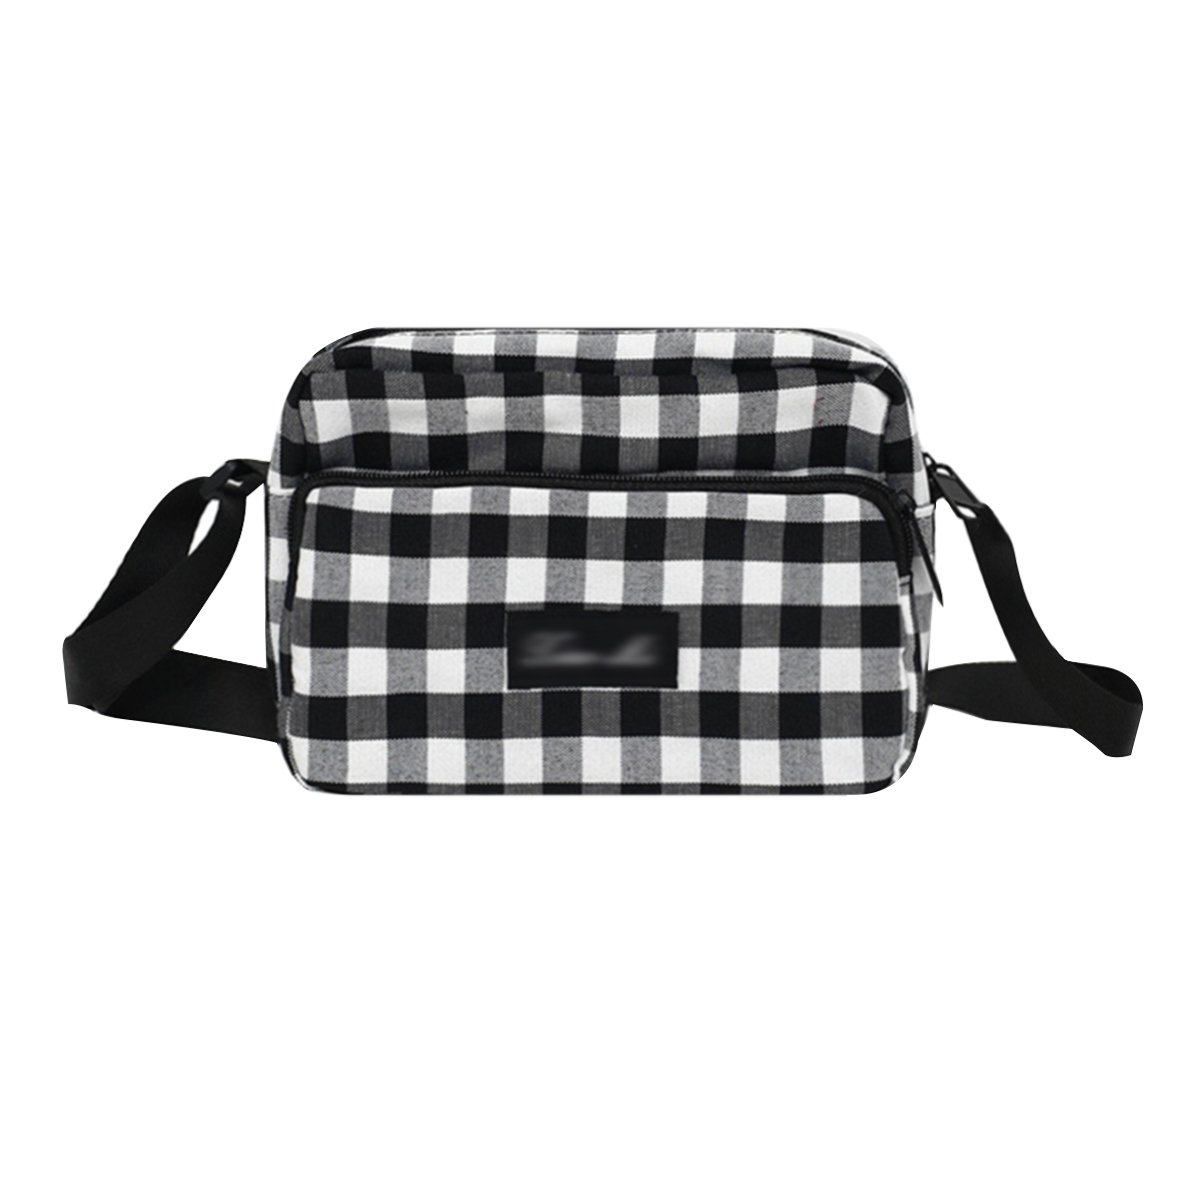 Heidi Bag Women Casual Cotton Plaid Checkered Gingham Crossbody Shoulder Bag